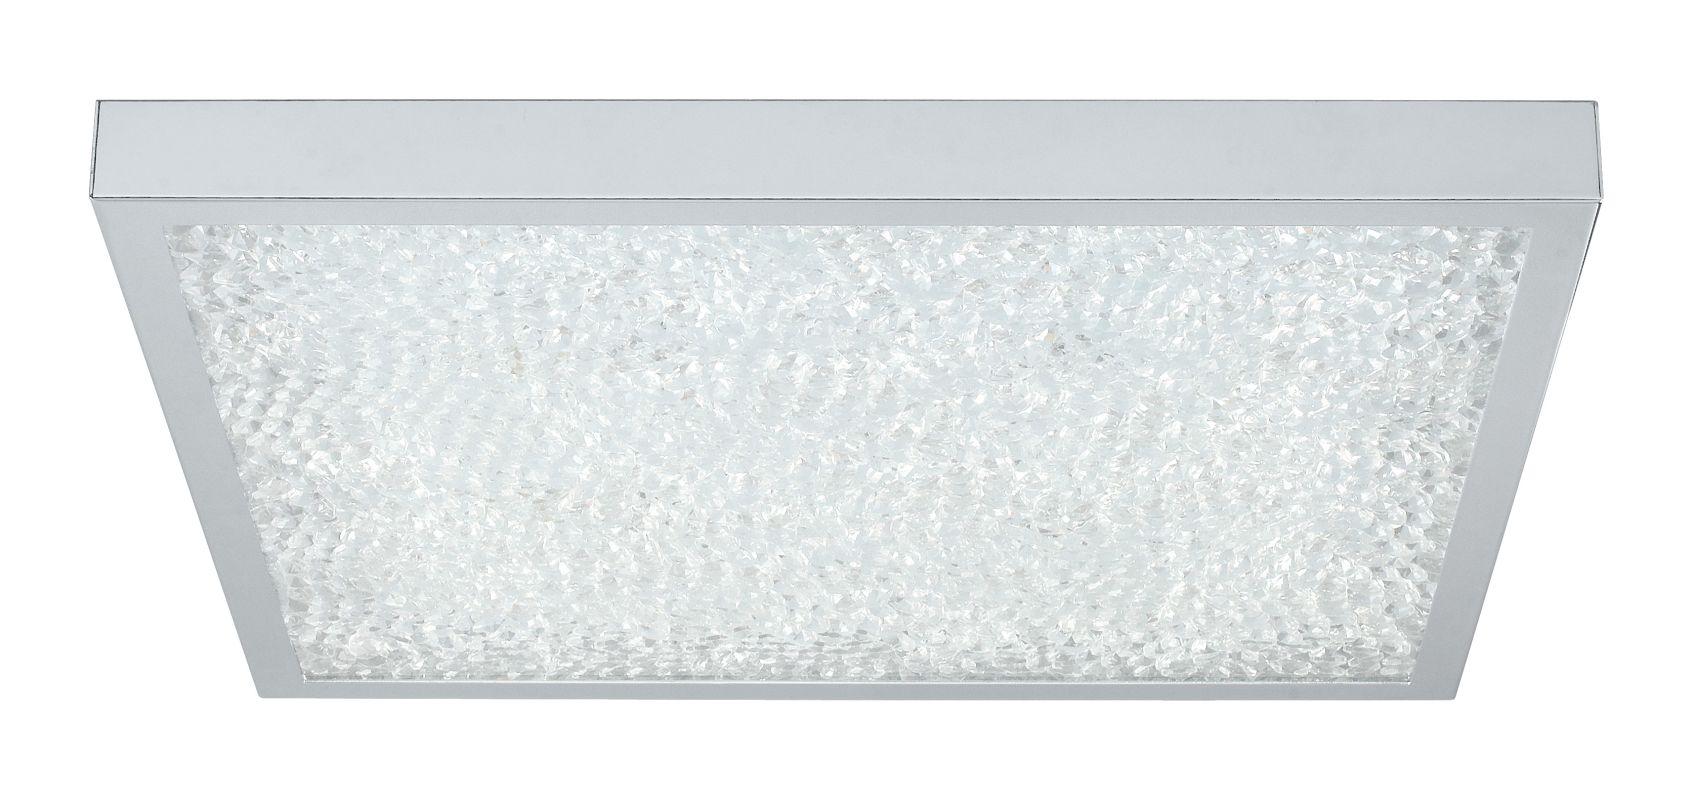 Eglo 92782 Cardito 2 Light LED Flush Mount Ceiling Fixture Chrome